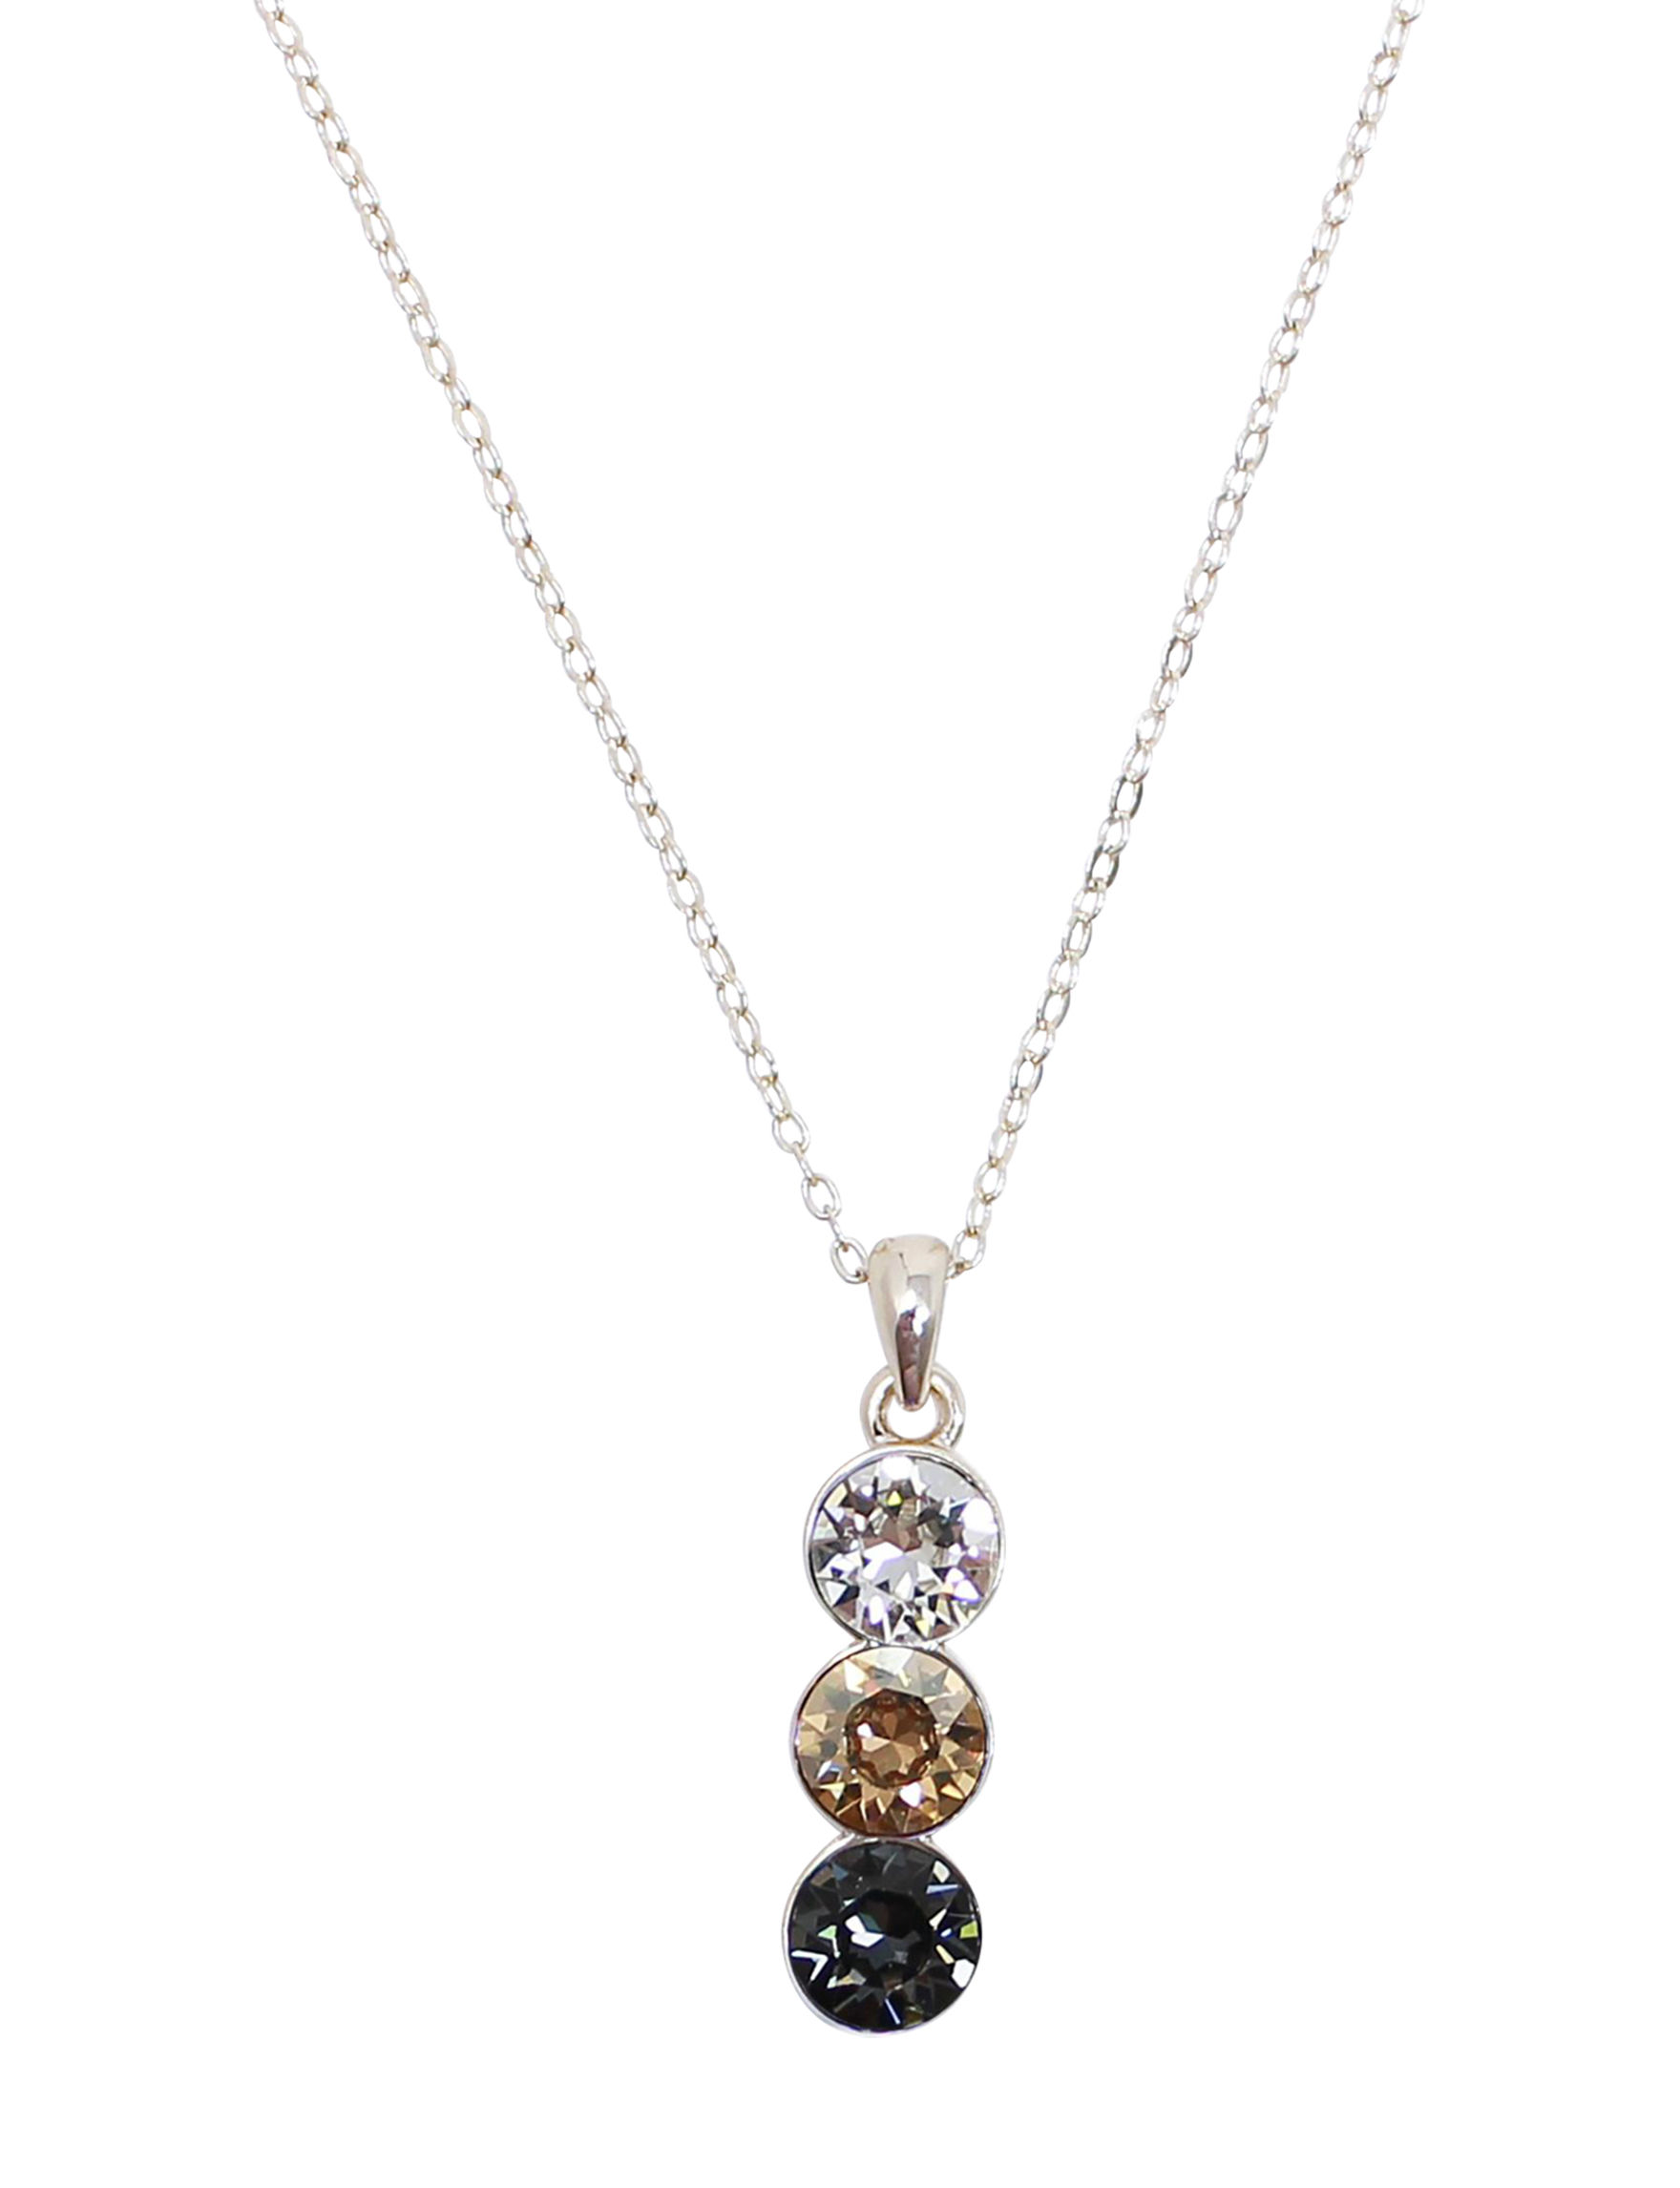 L & J Black Crystal Necklaces & Pendants Fine Jewelry